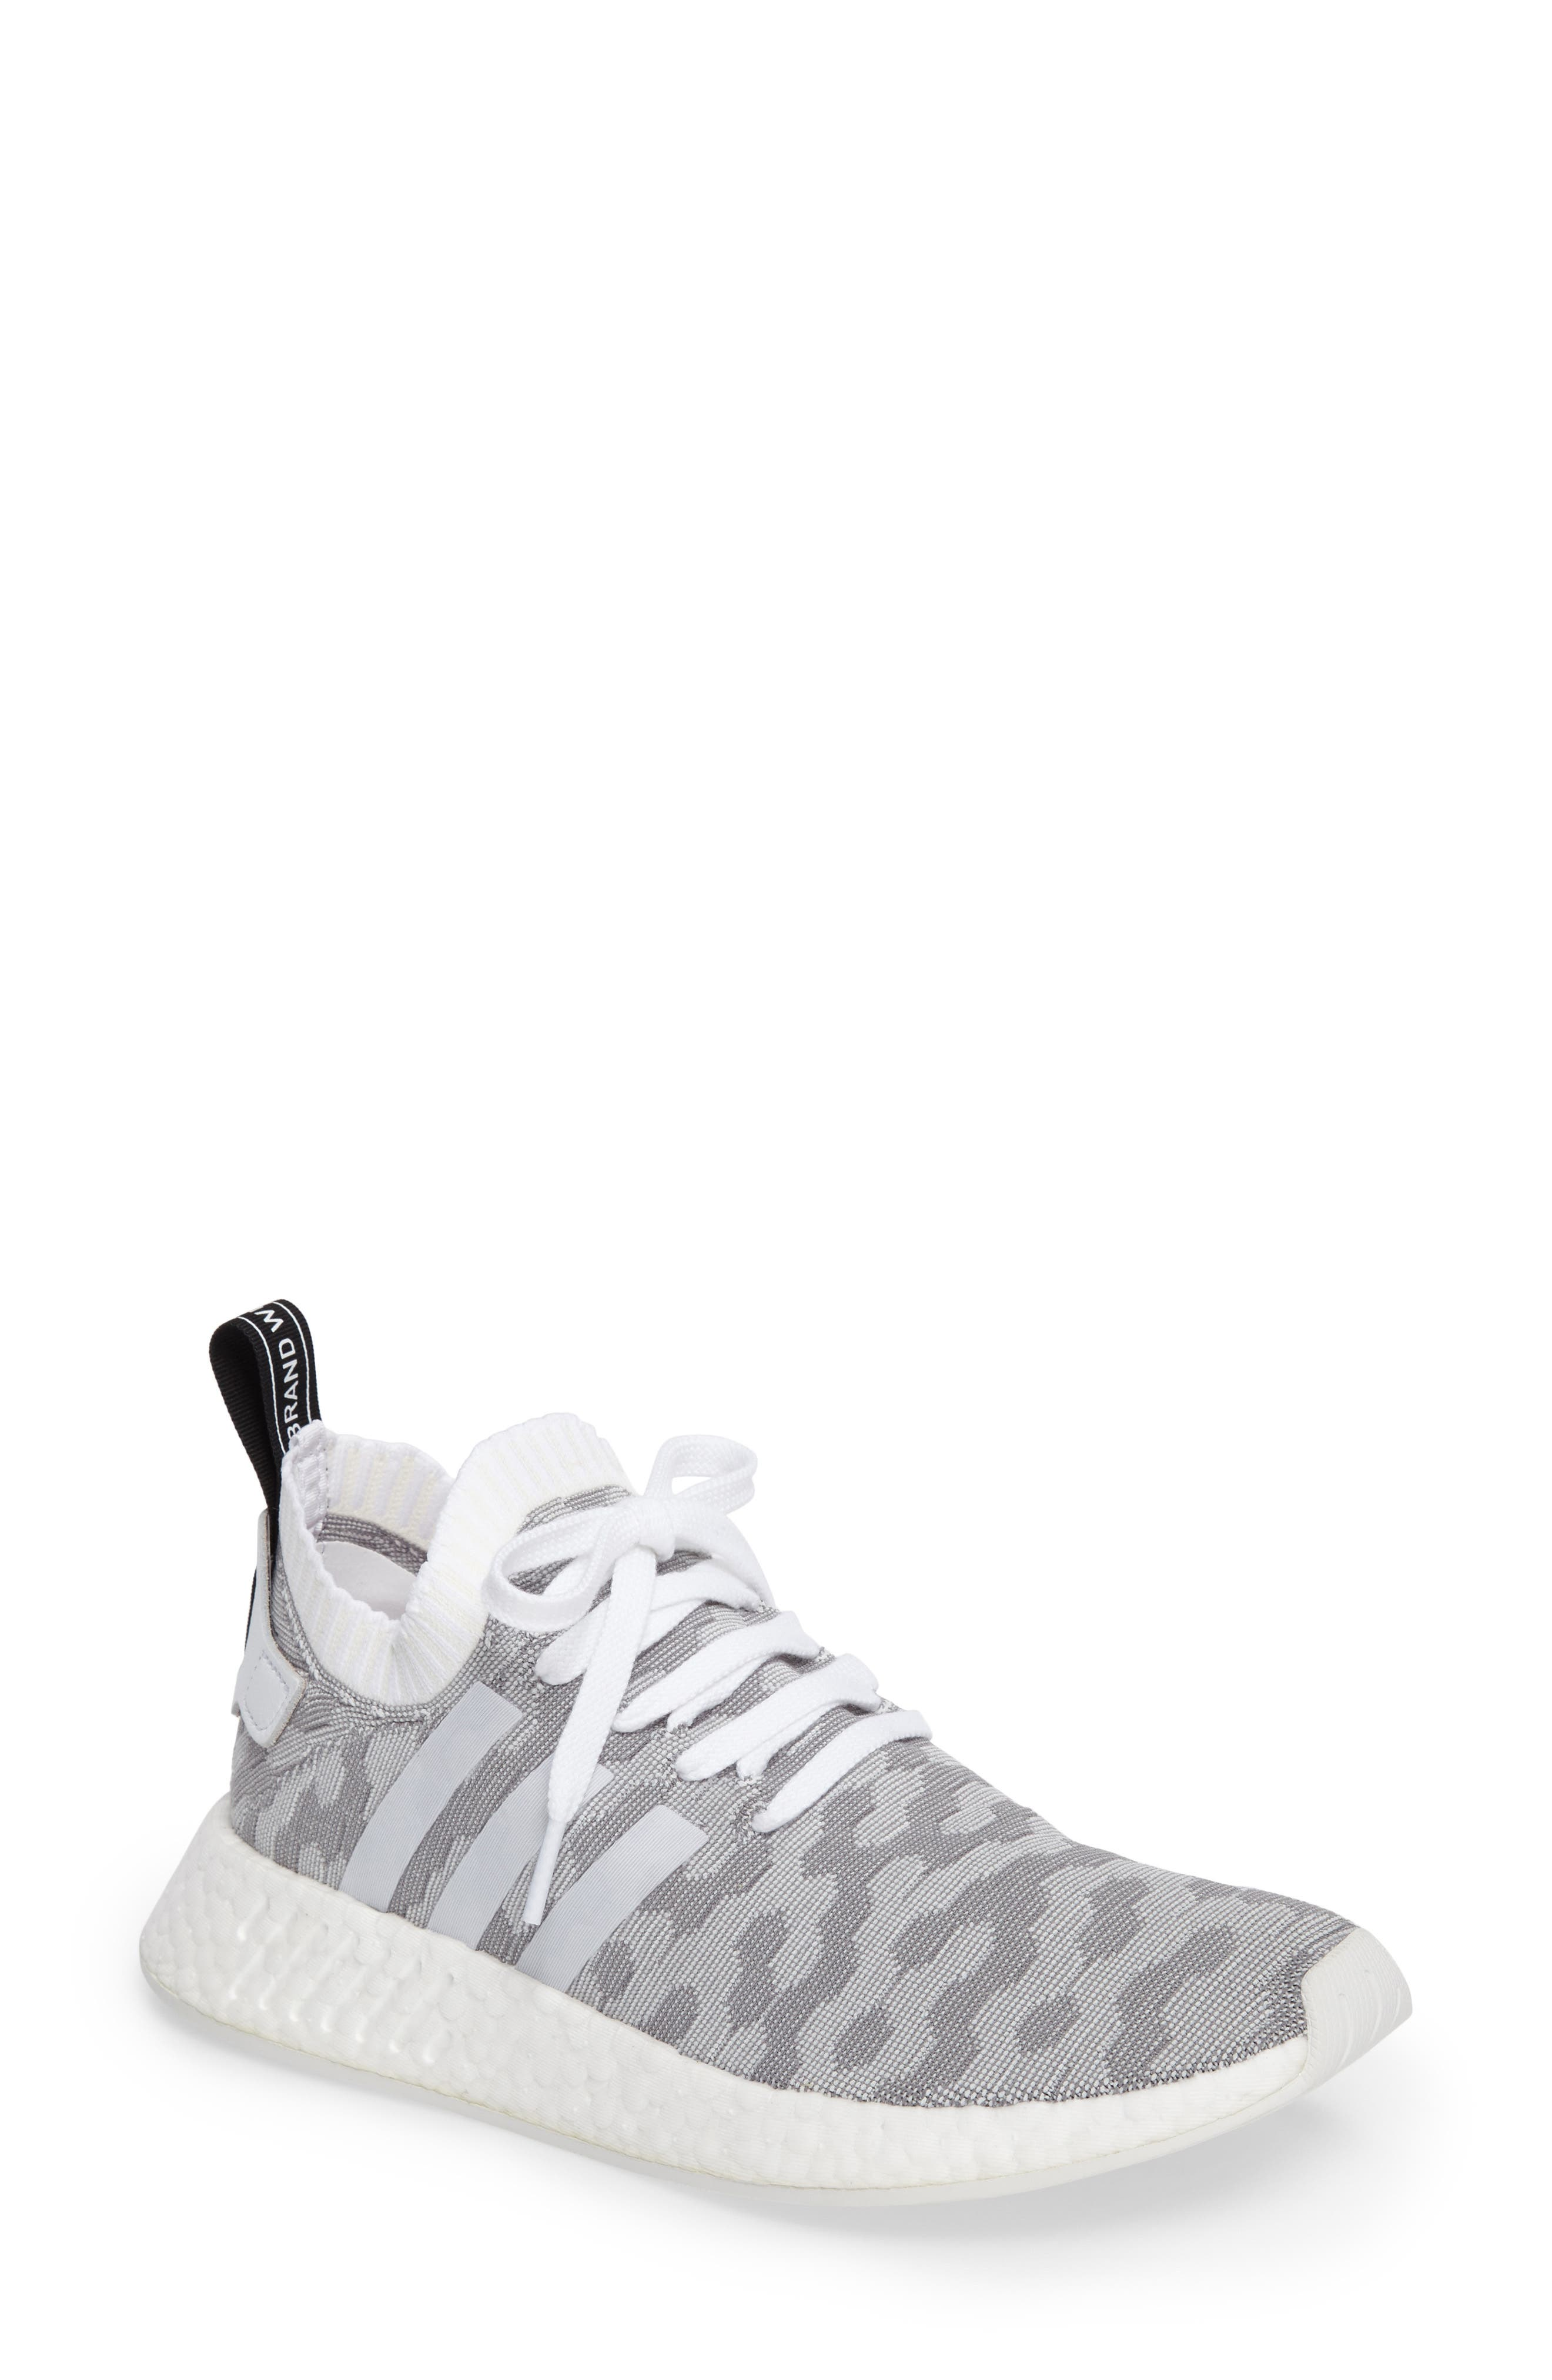 NMD R2 Primeknit Athletic Shoe,                             Main thumbnail 4, color,